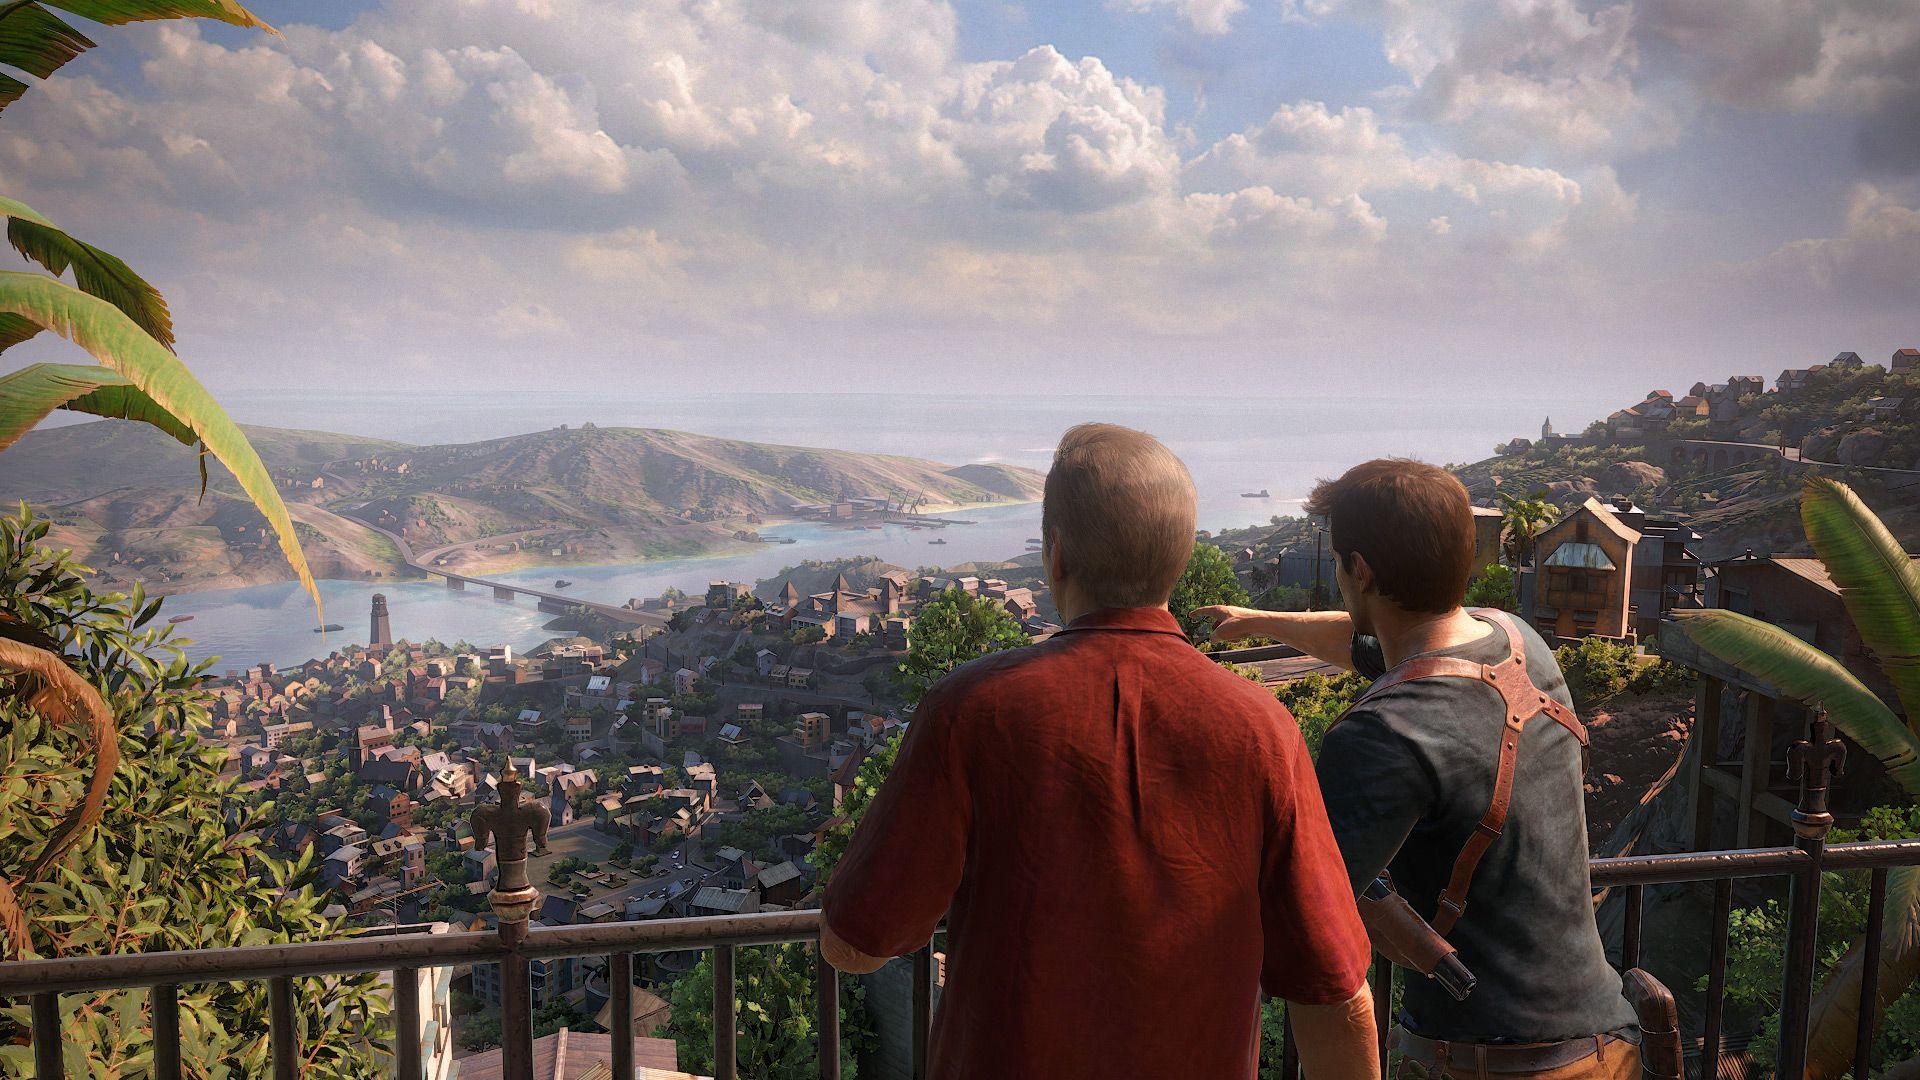 En kjapp Uncharted 4-omtale uten spoilers